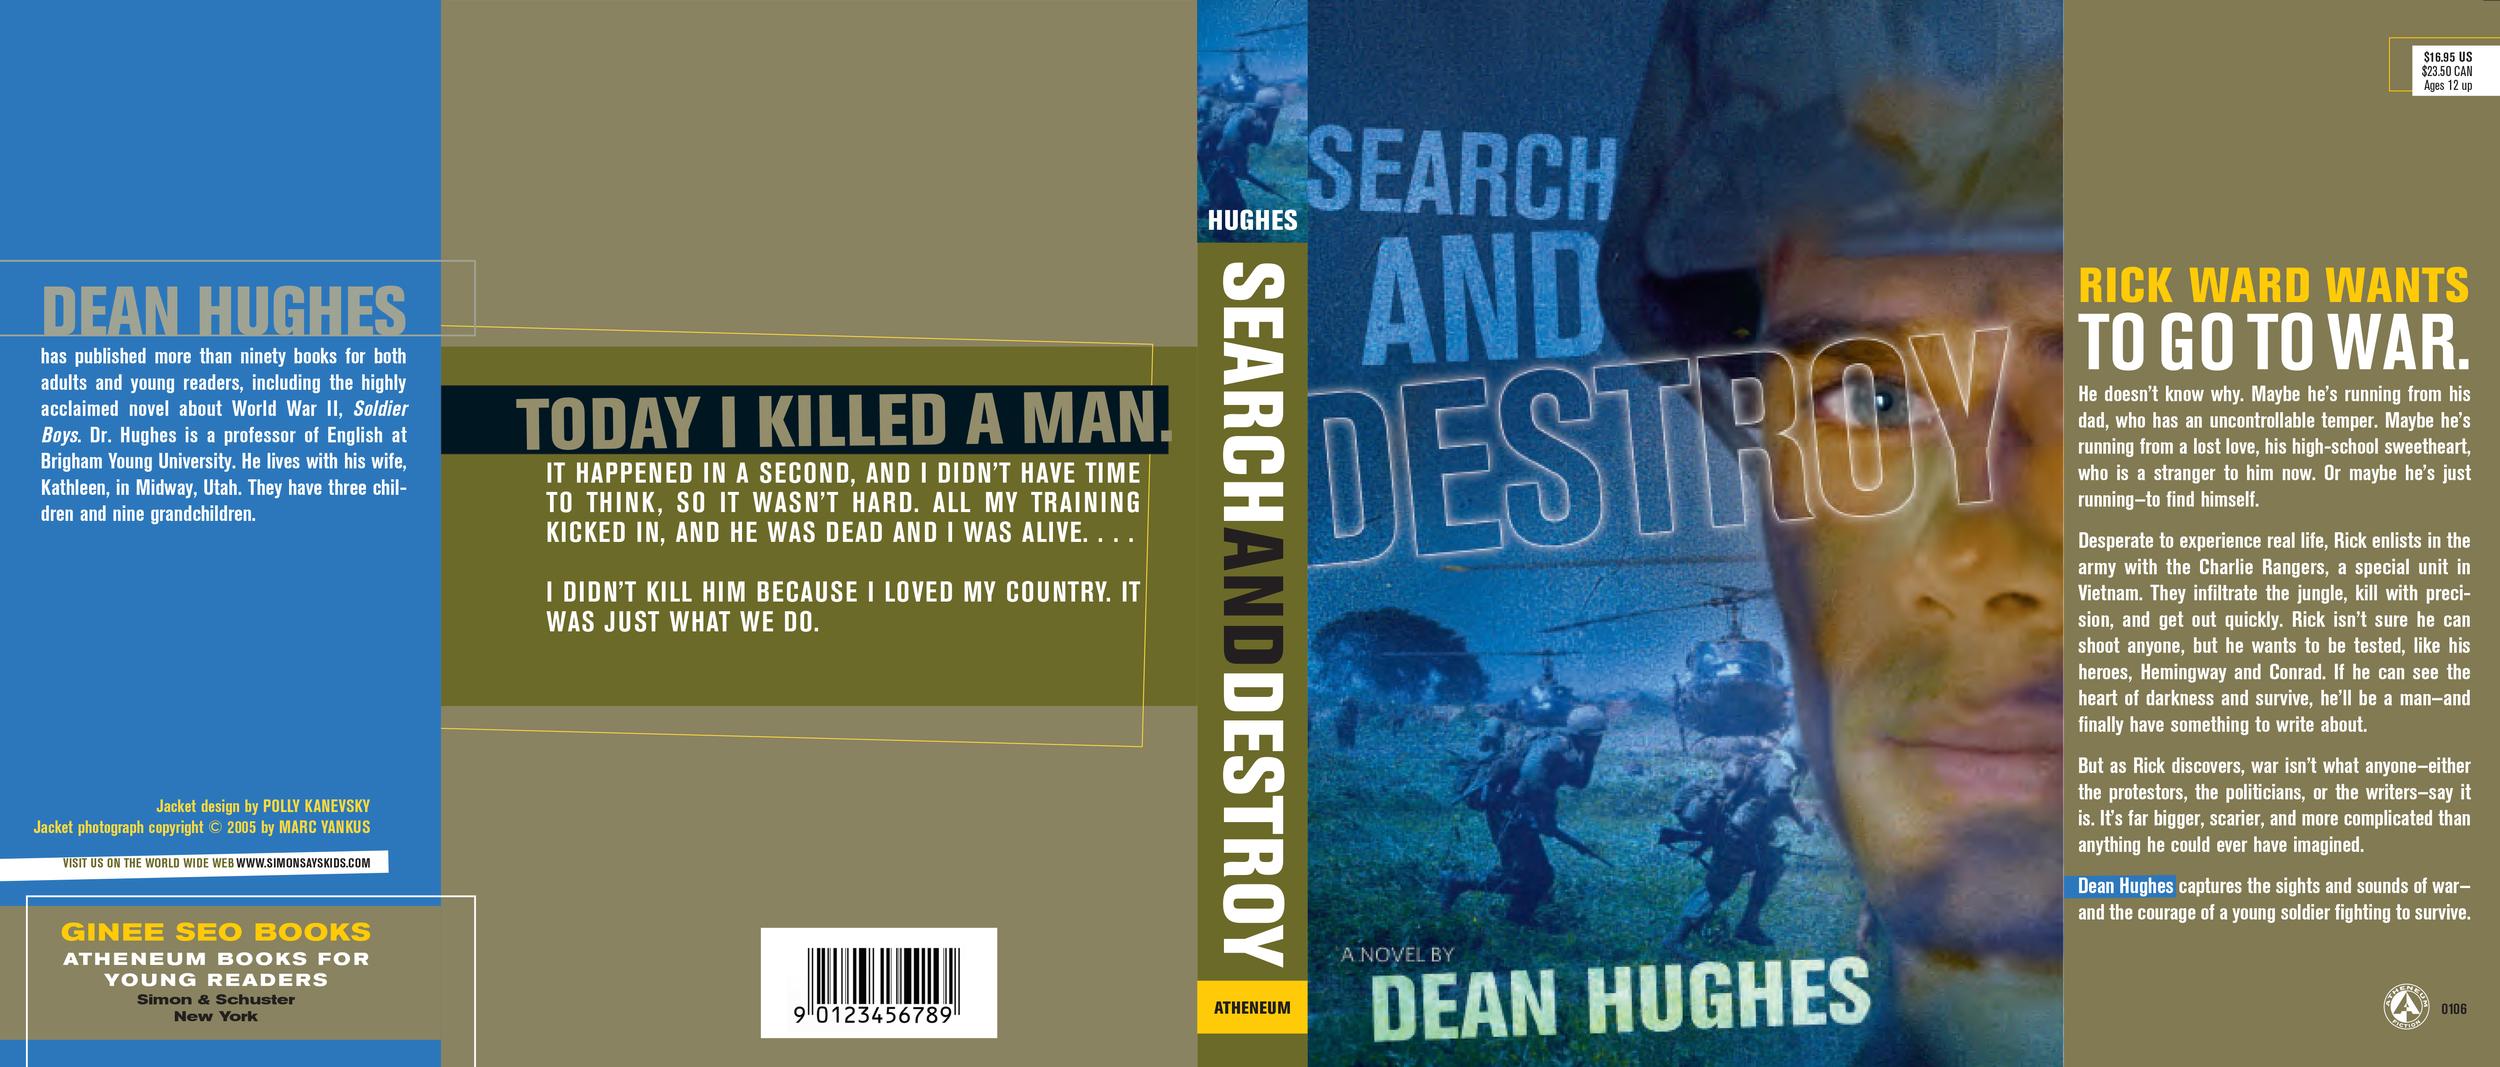 Search and Destroy.Simon & Schuster.Novel Jacket.jpg